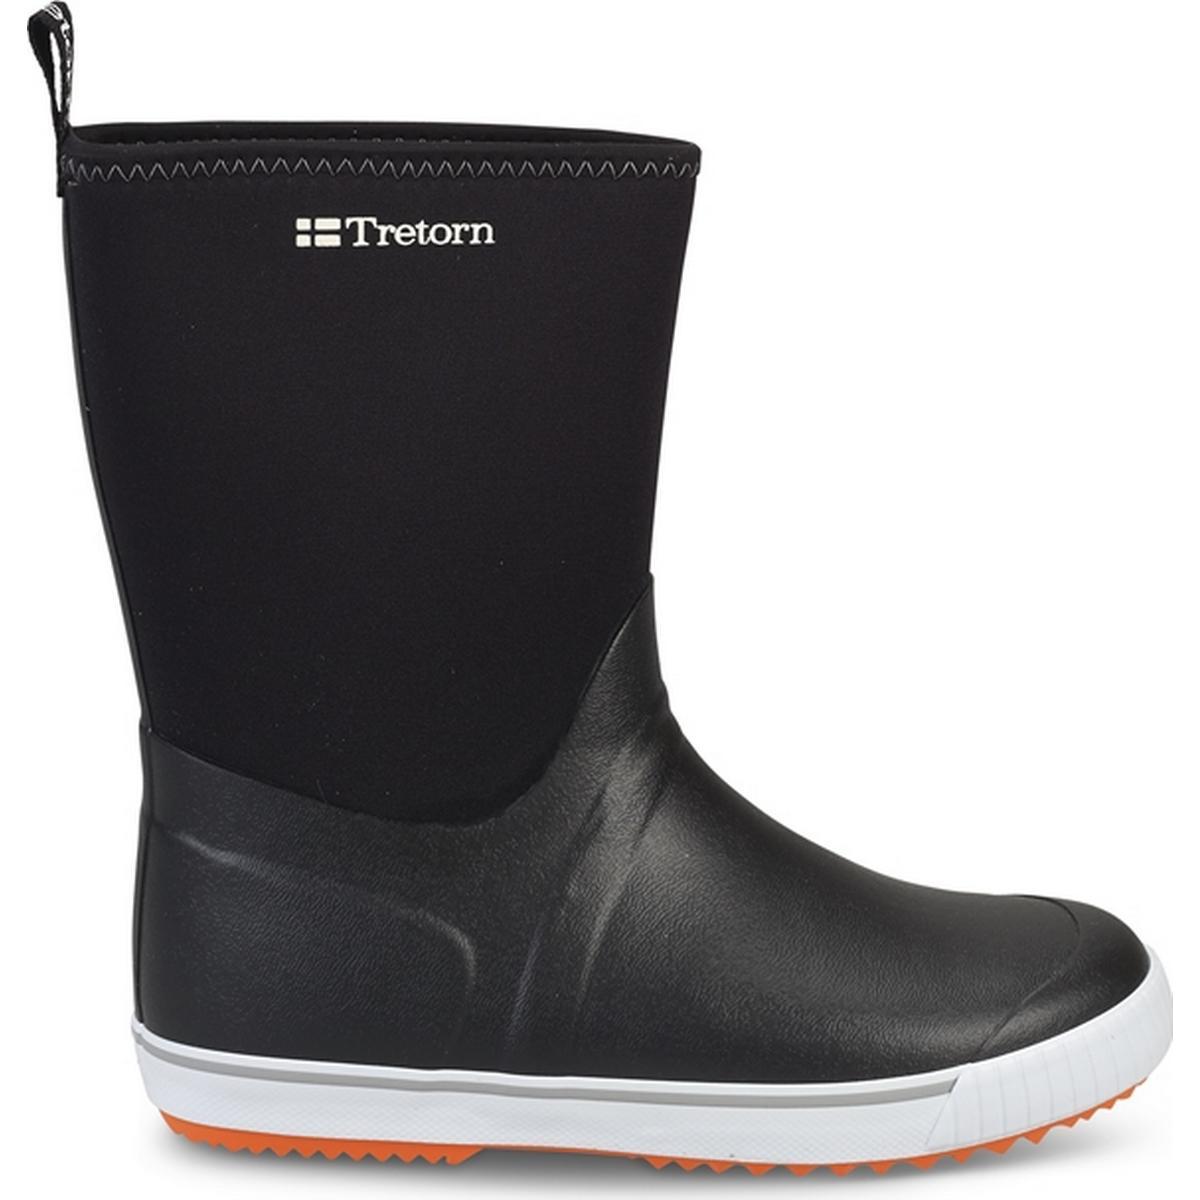 2c18dc9d Tretorn Gummistøvler - Sammenlign priser hos PriceRunner